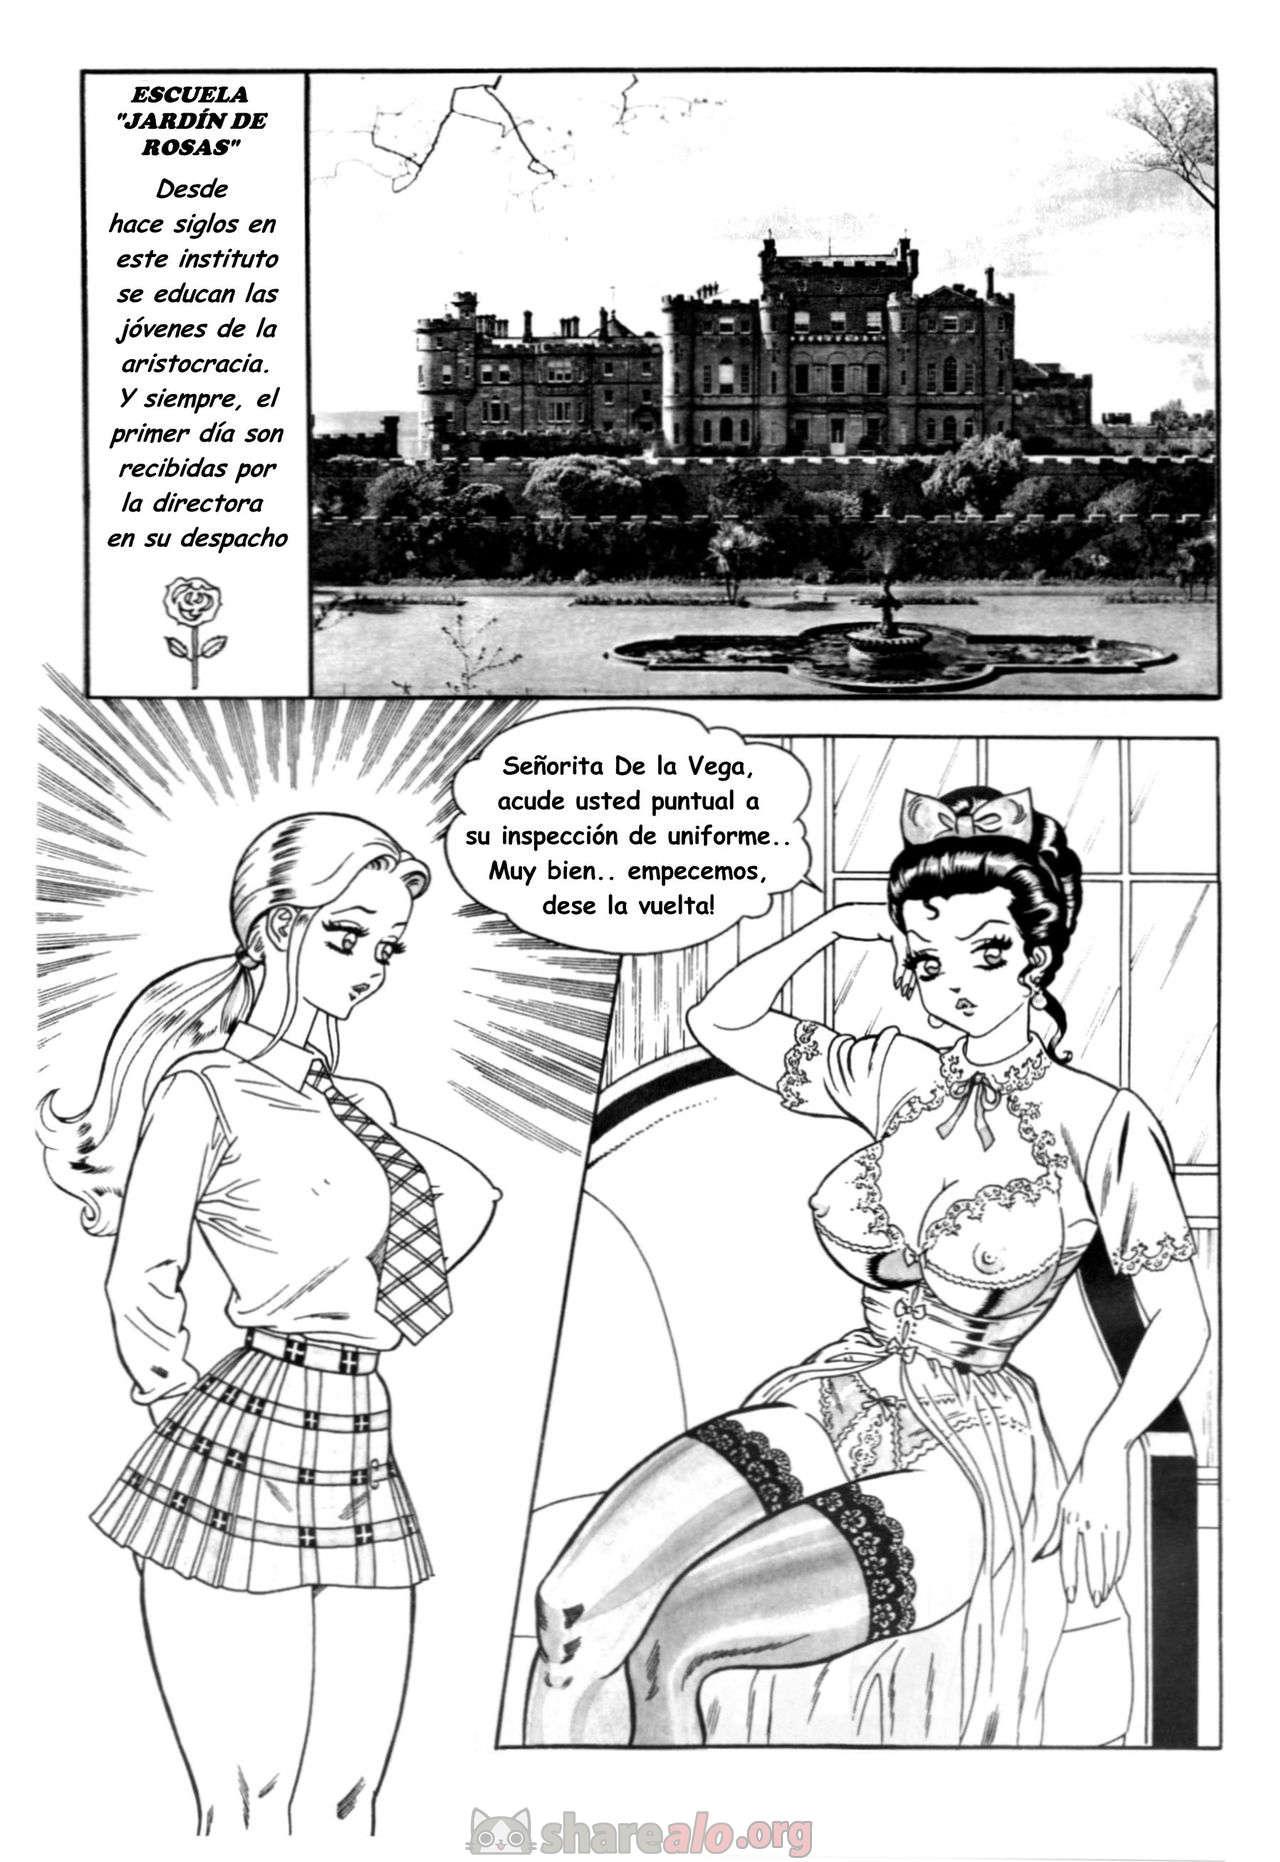 [ Escuela de Señoritas (Jardín de Rosas Manga Hentai) ]: Comics Porno Manga Hentai [ TRJDATqo ]